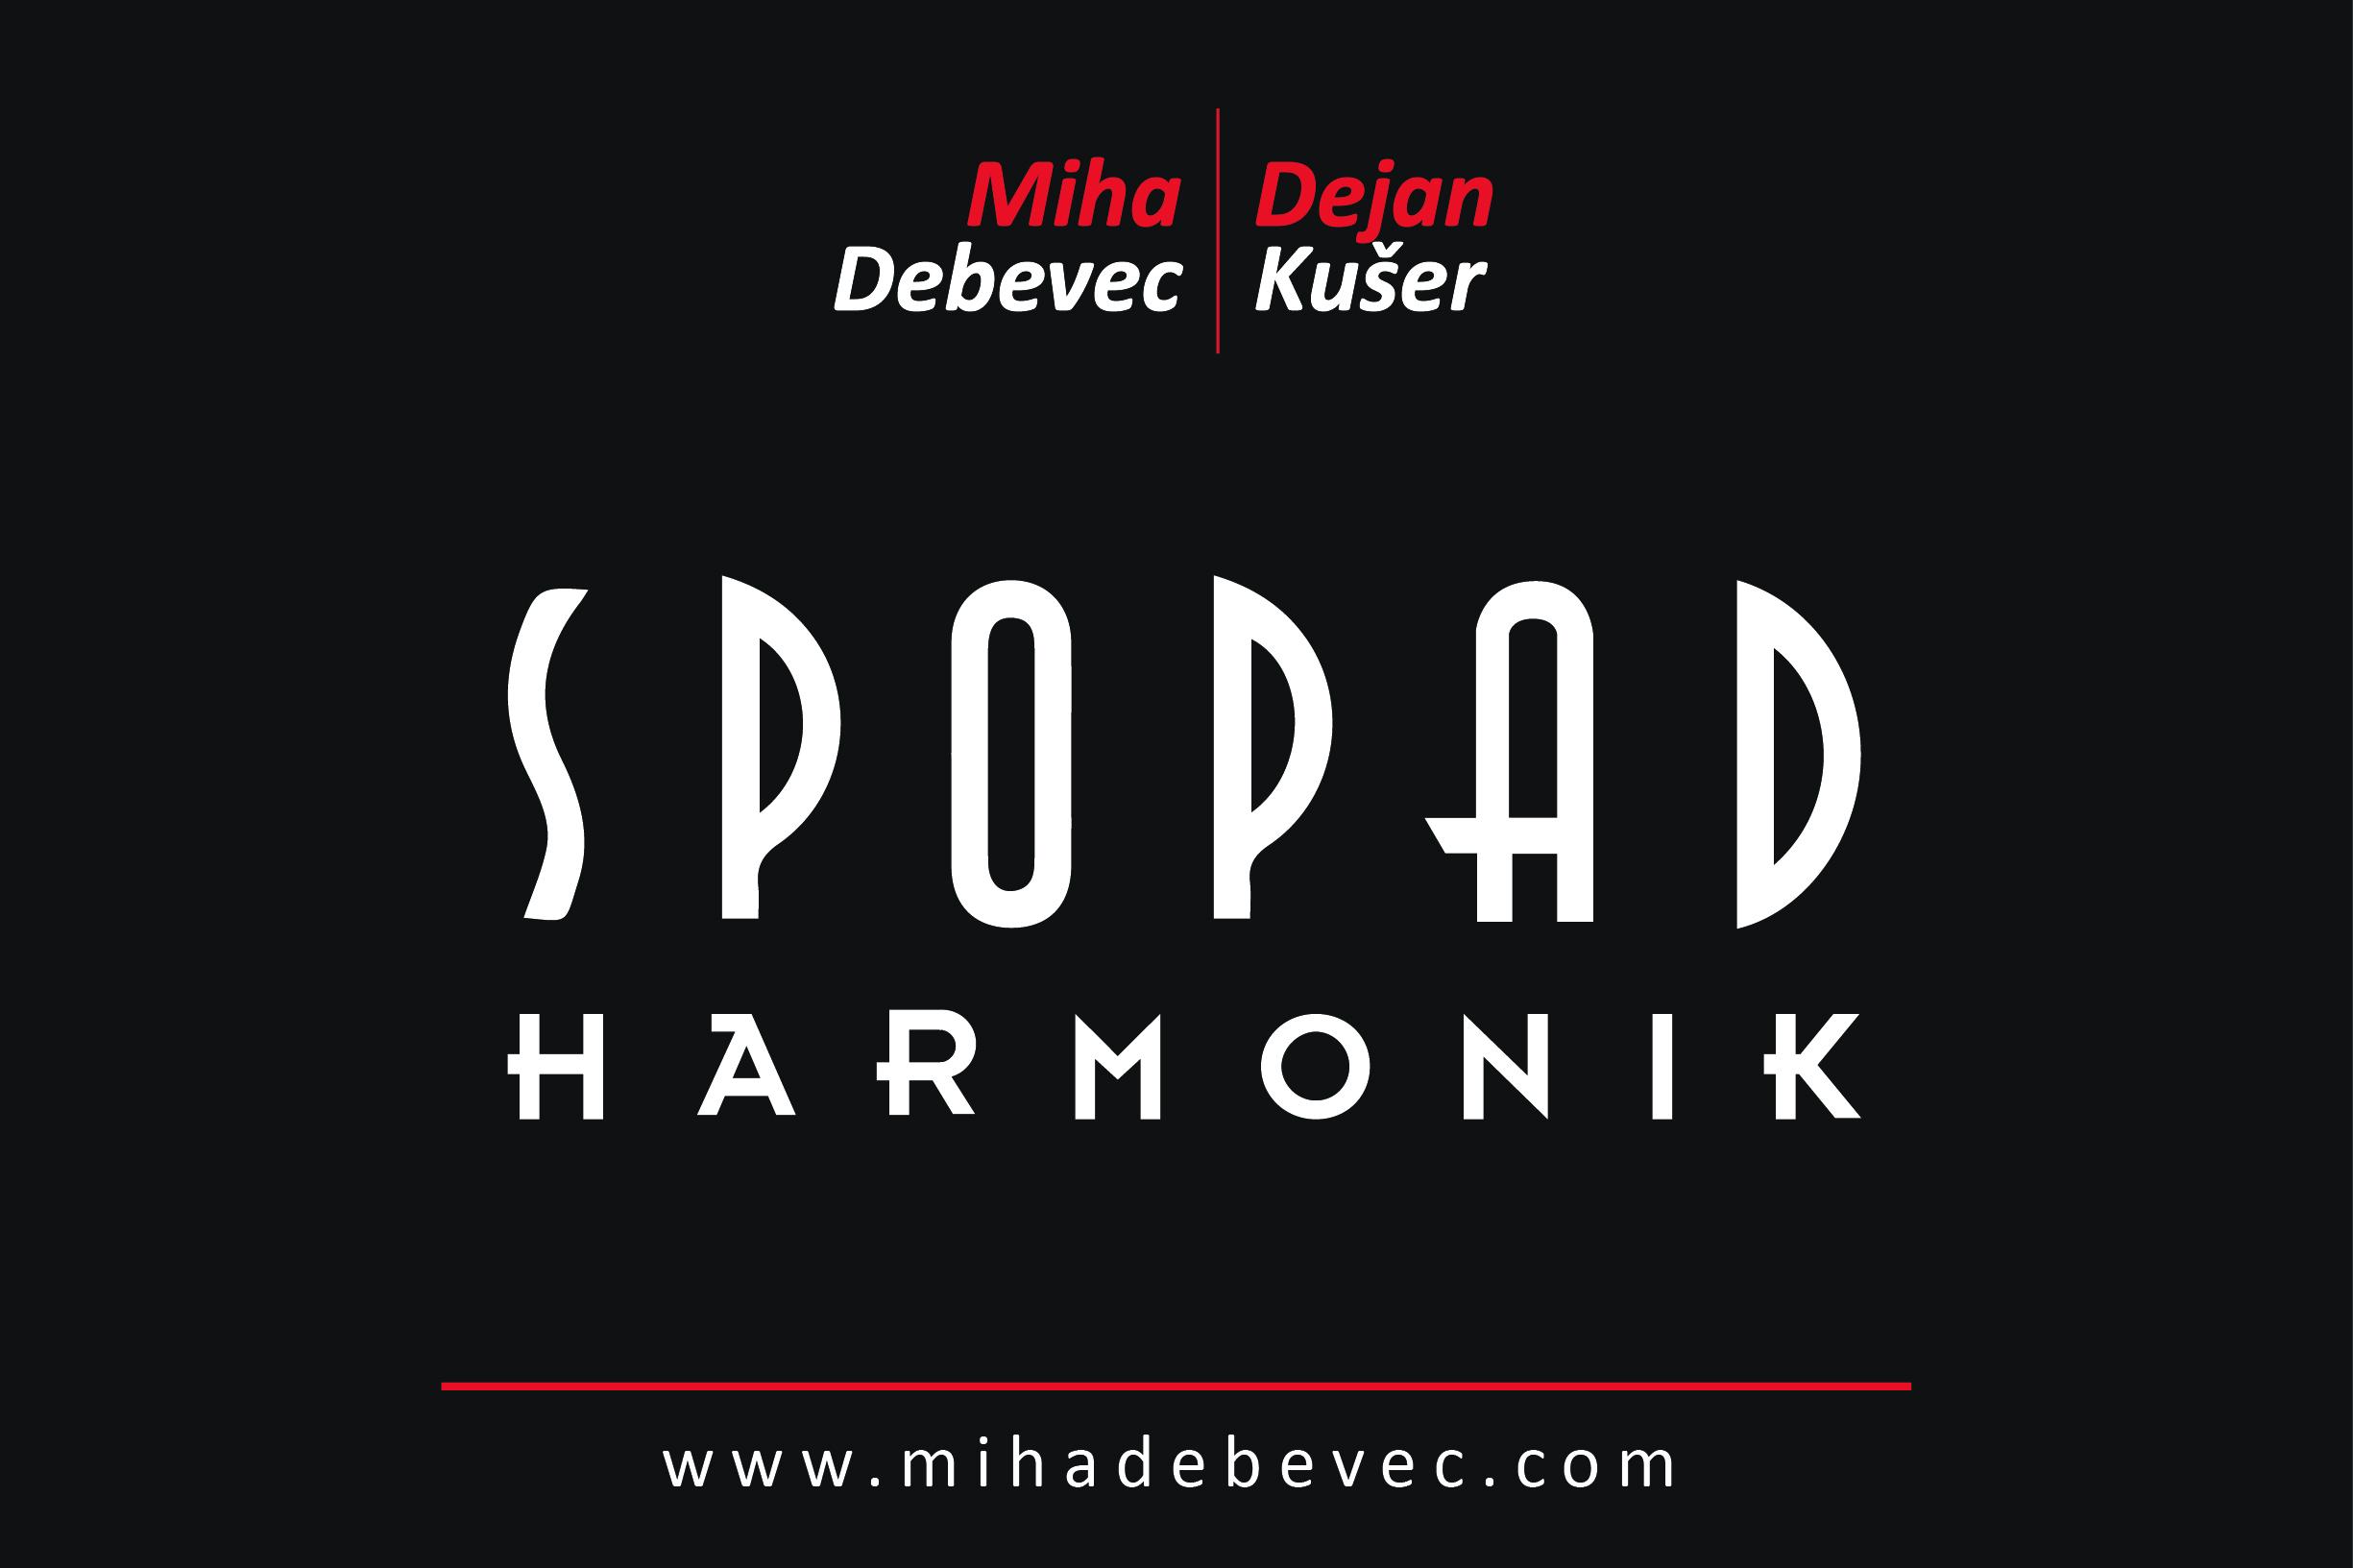 Spopad-harmonik